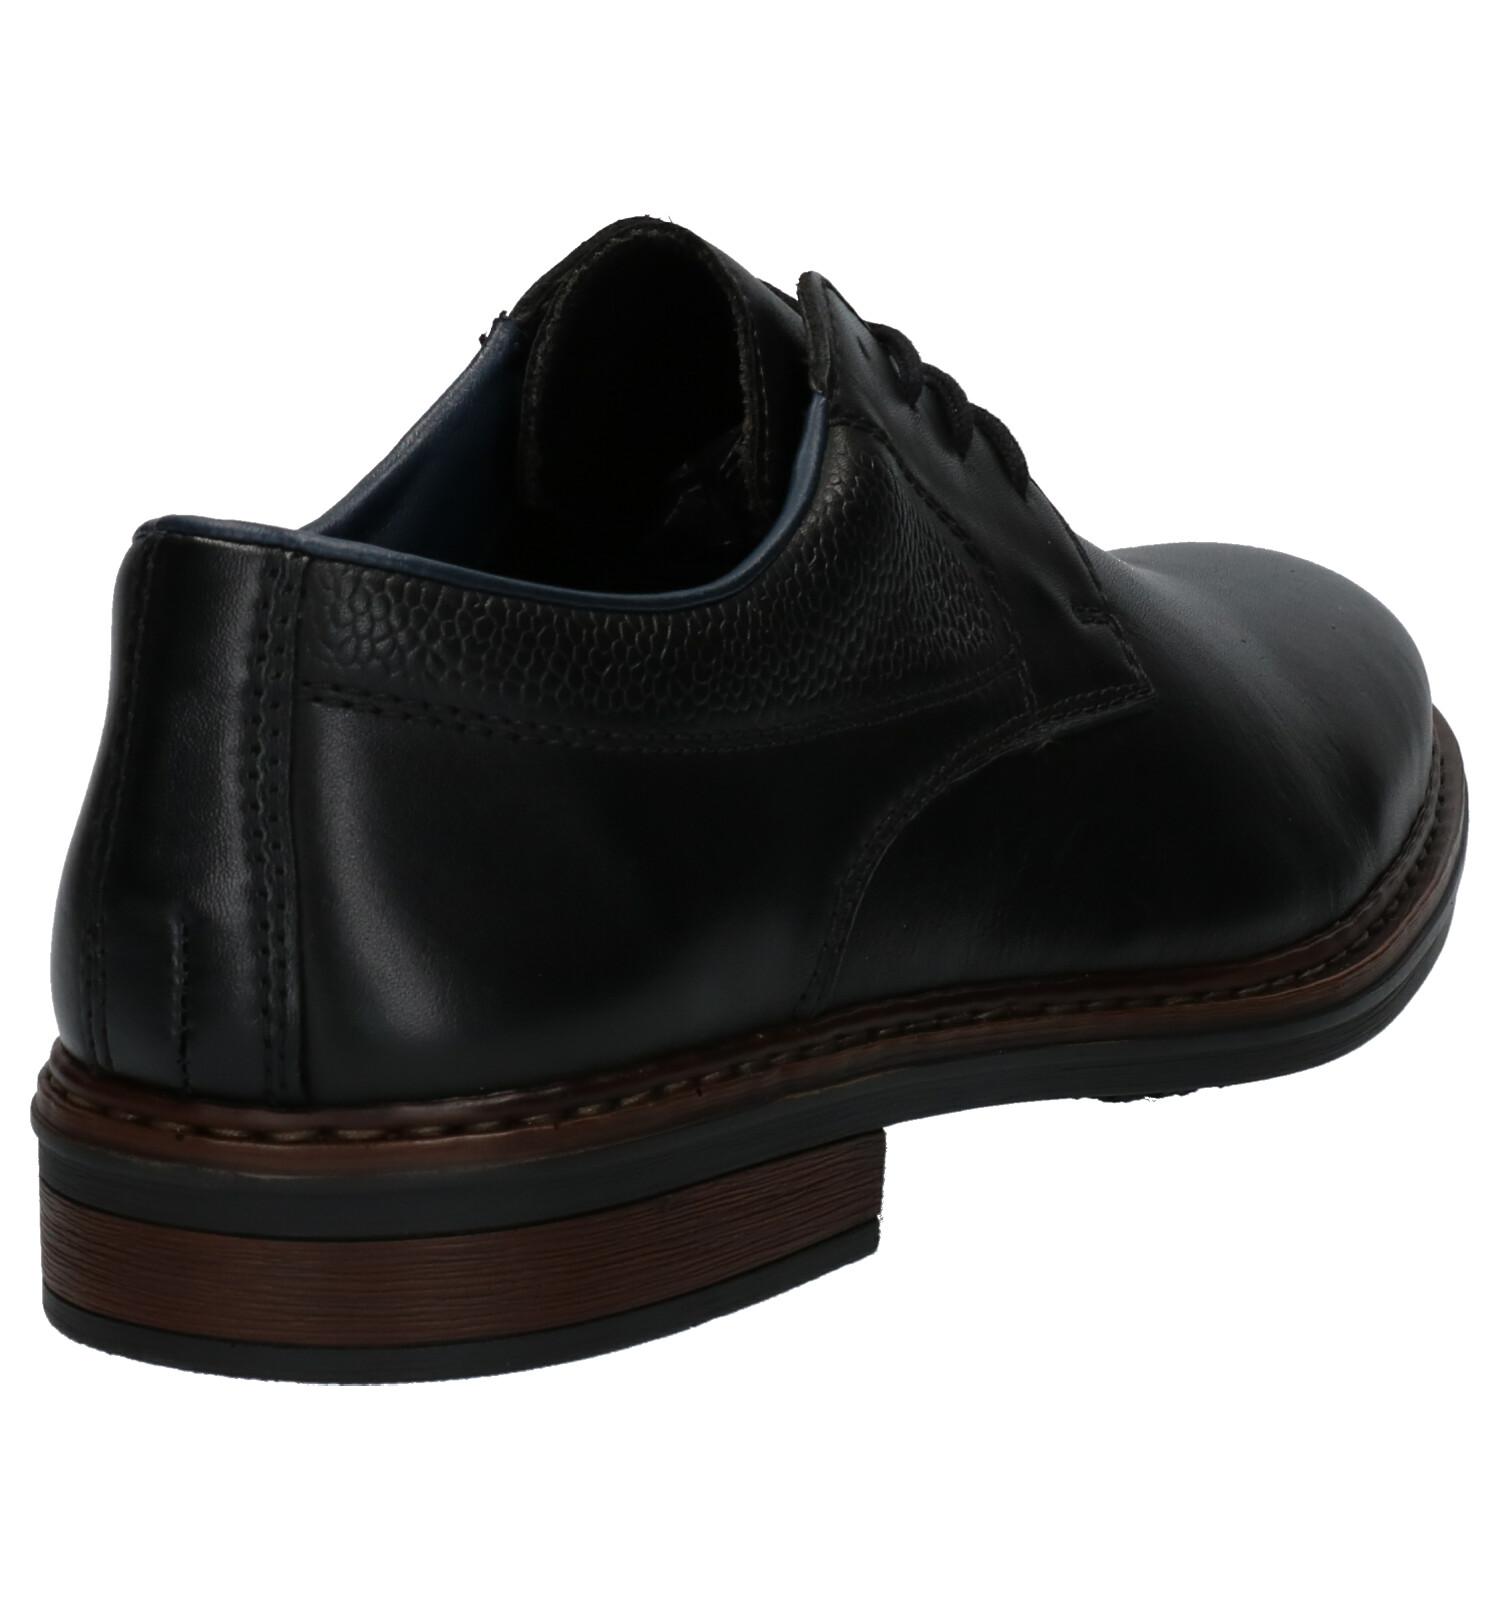 Veterschoenen Zwarte Rieker Geklede Zwarte Rieker K3F1JuTlc